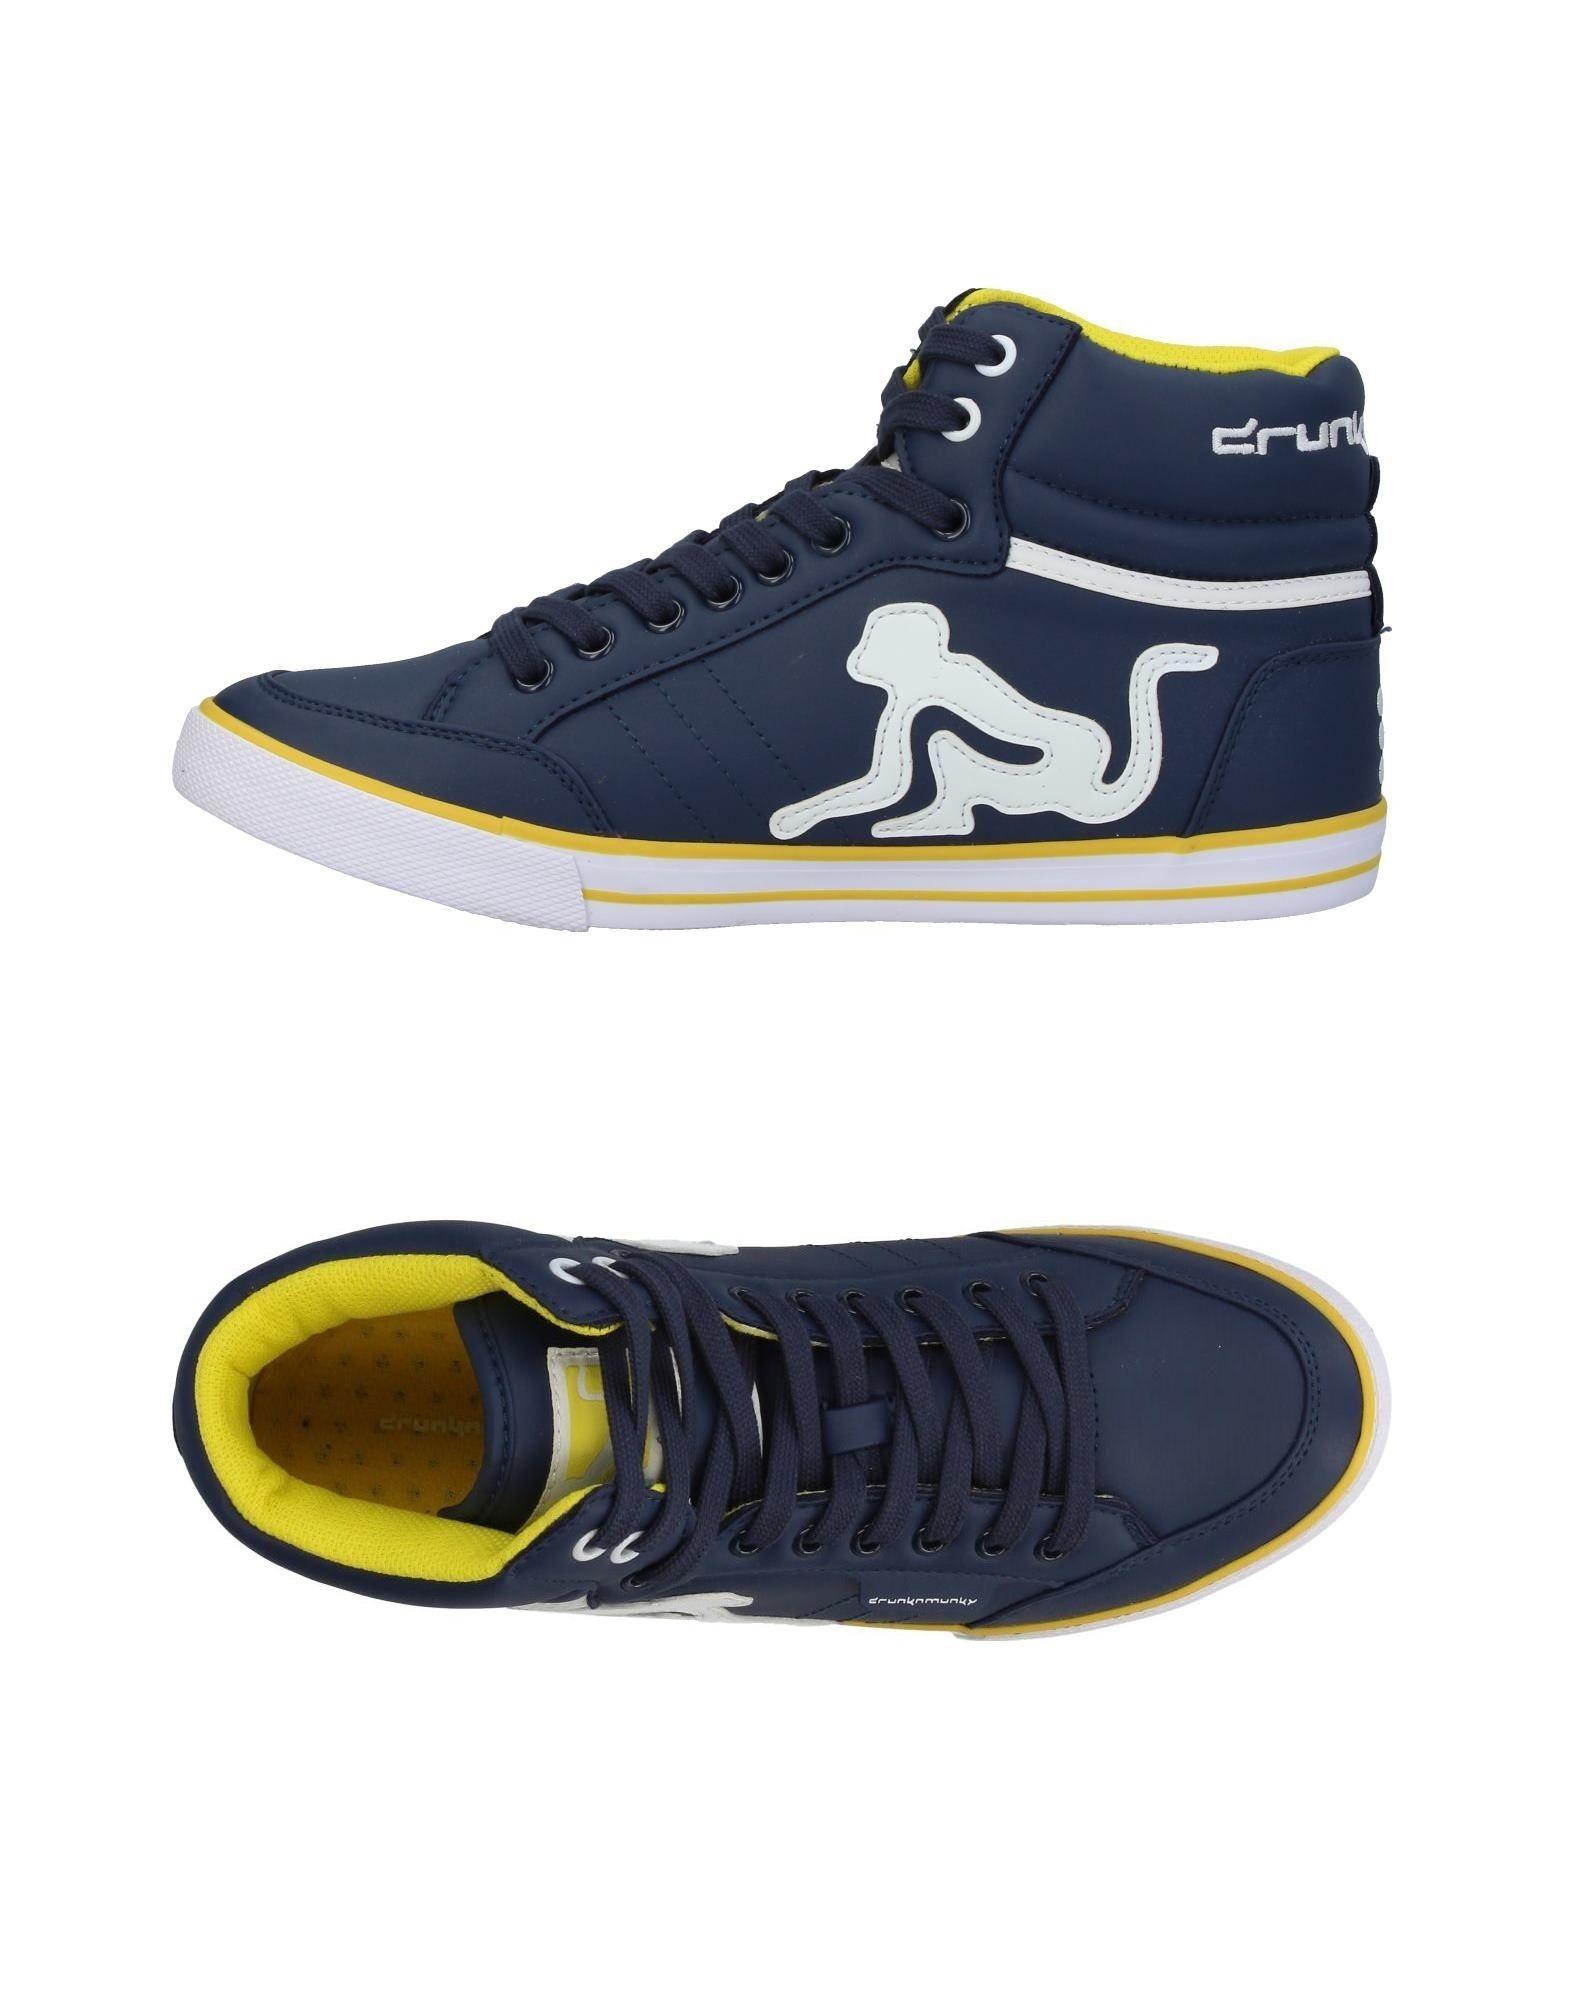 Rabatt echte  Schuhe Drunknmunky Sneakers Herren  echte 11417521UL e6b541